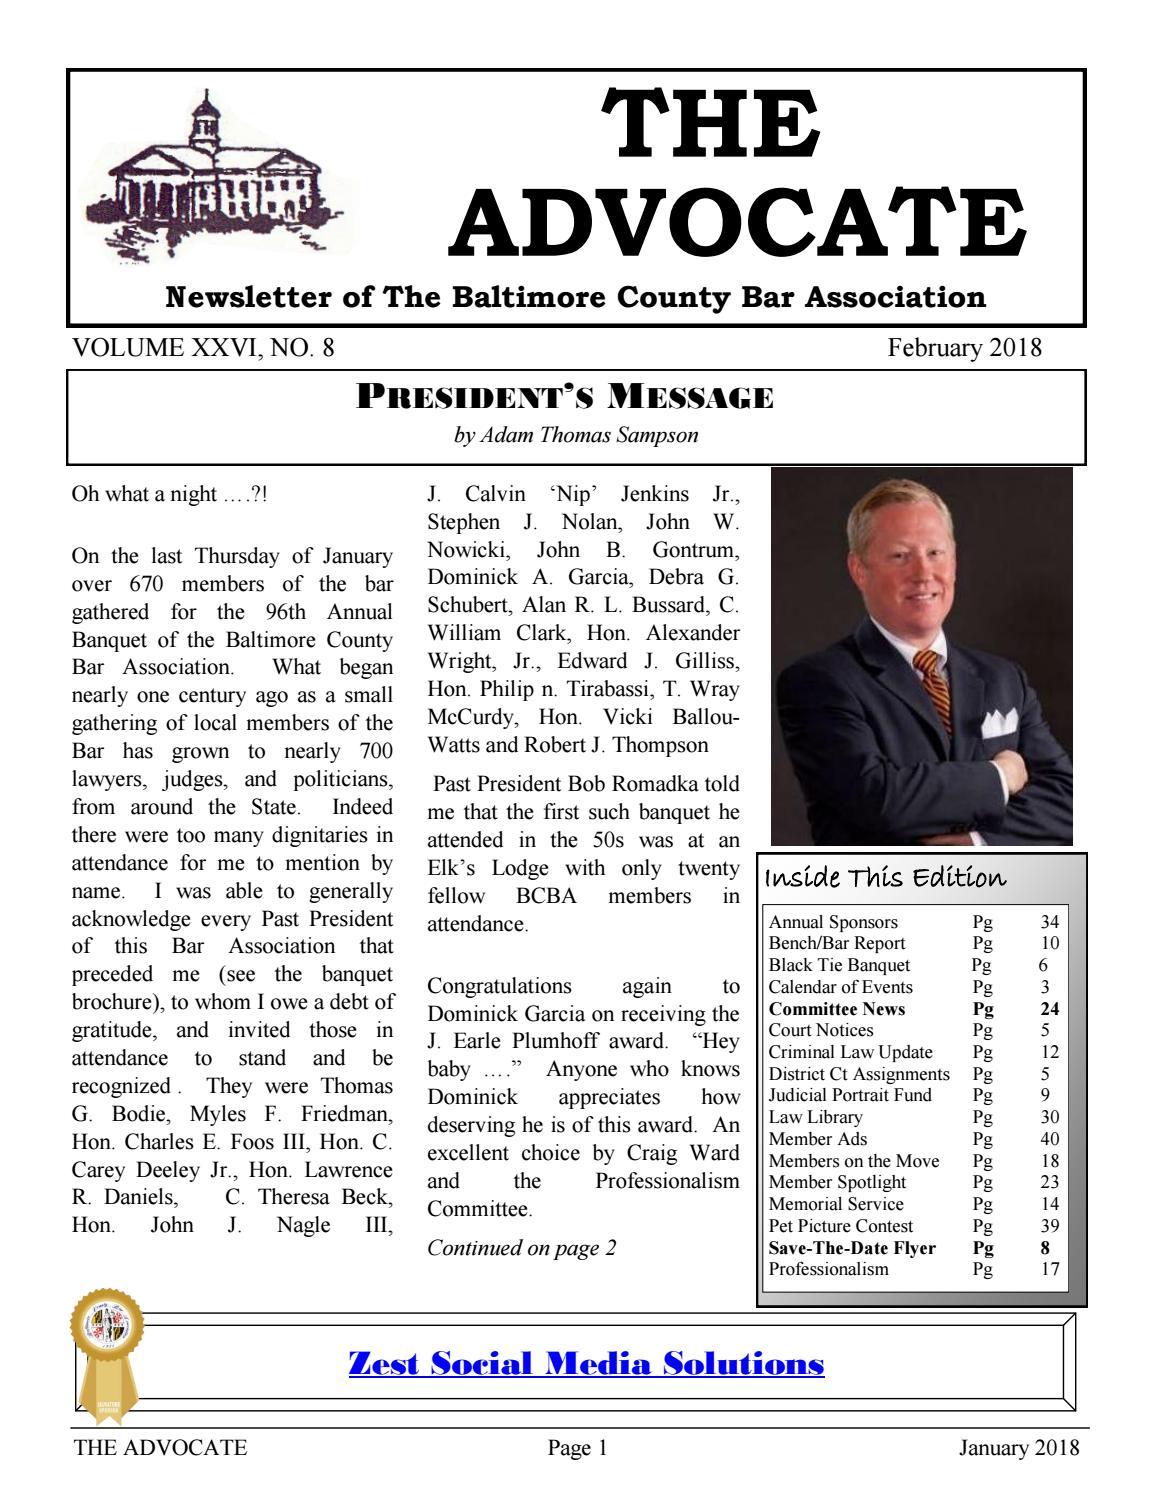 Sensational Advocate February 2018 By Baltimore County Bar Association Inzonedesignstudio Interior Chair Design Inzonedesignstudiocom